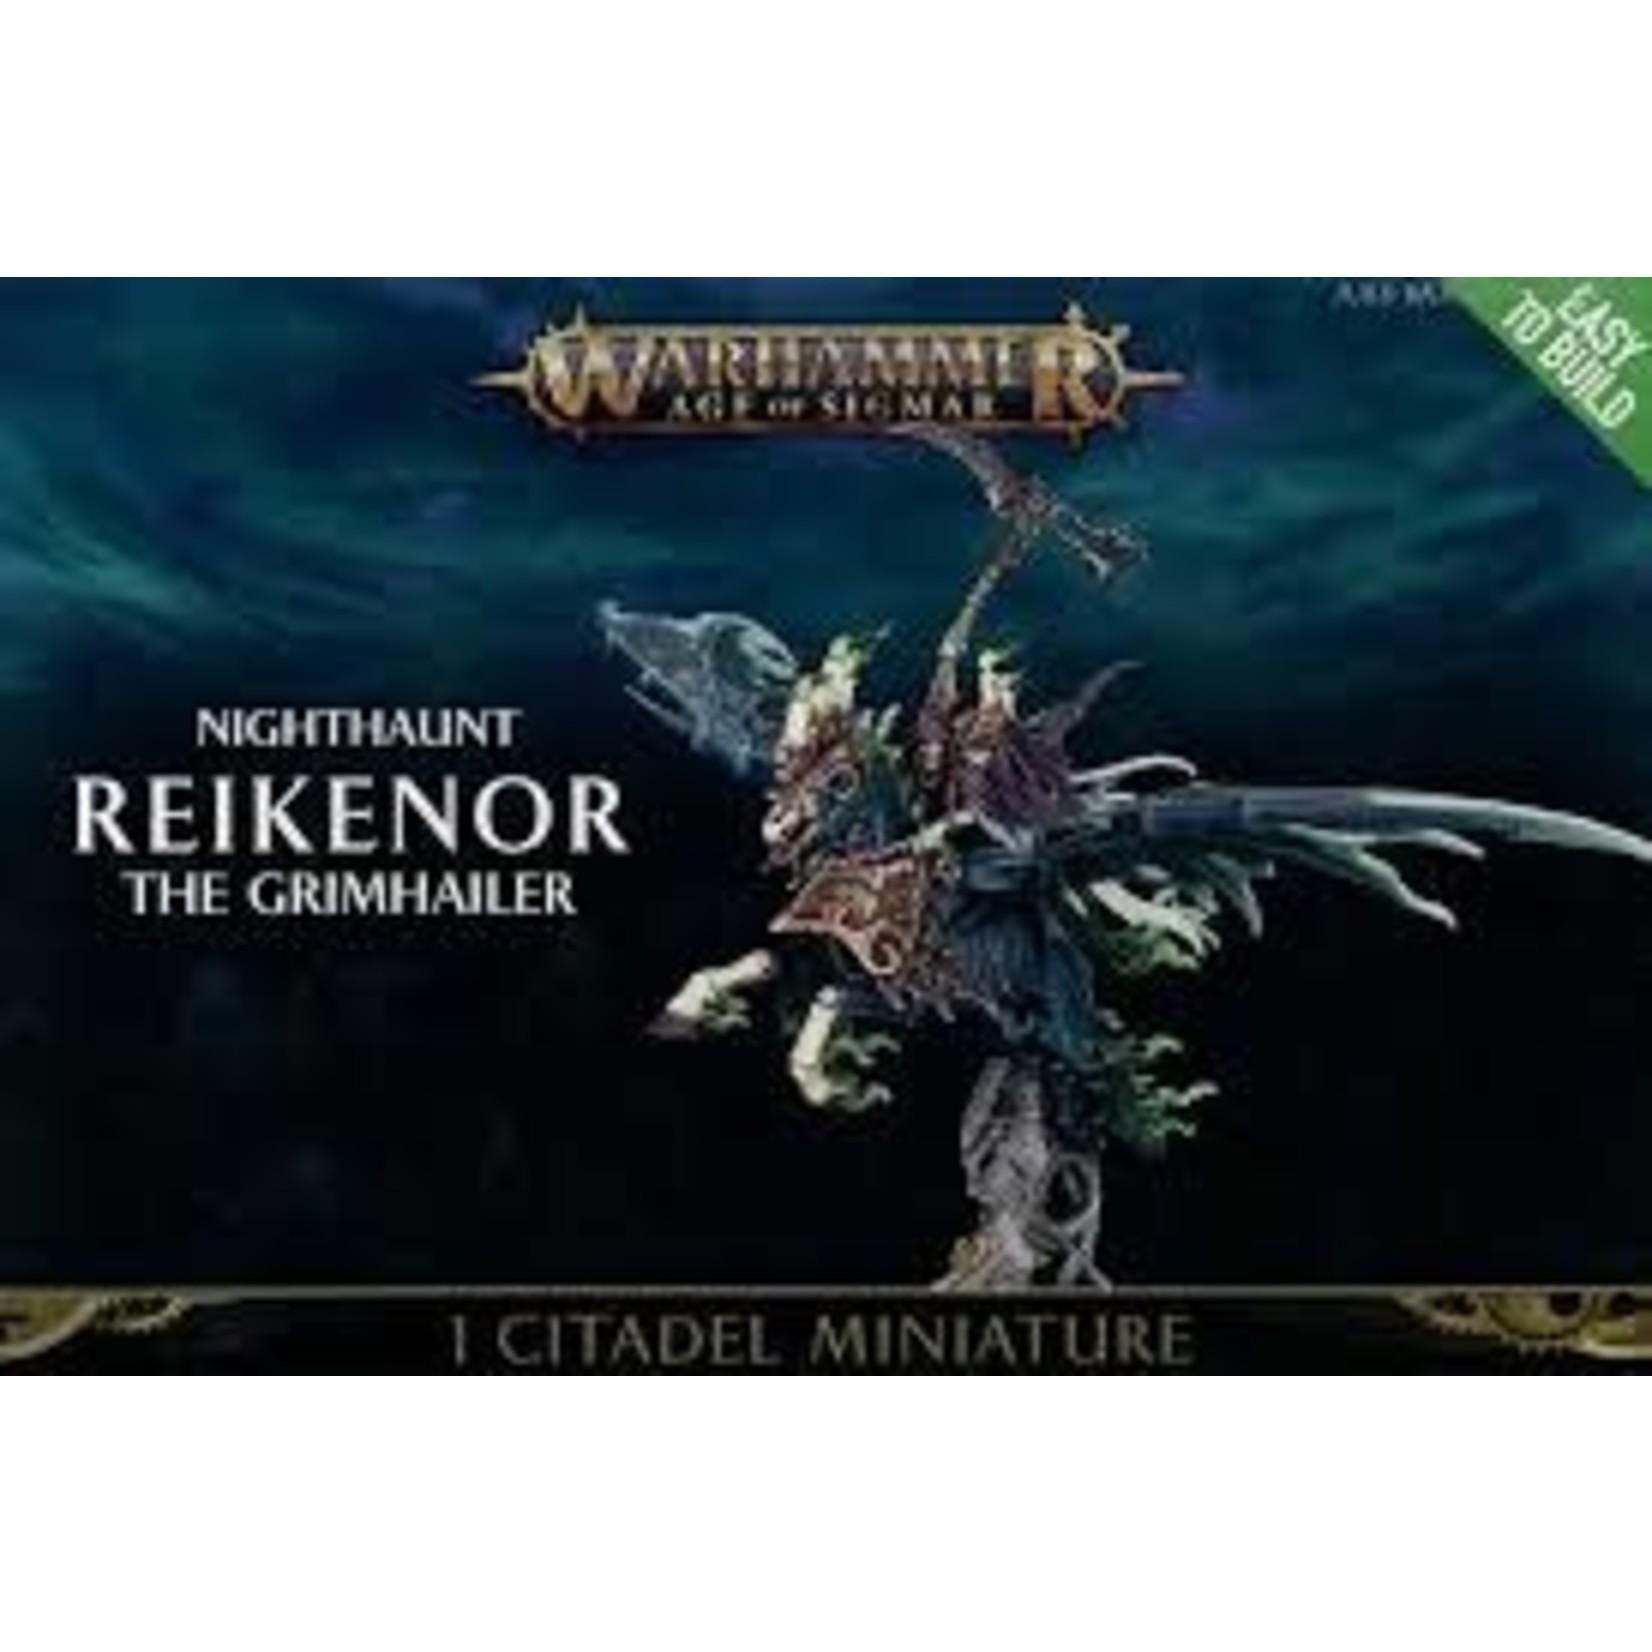 Nighthaunt Reikenor the Grimhailer (AOS)